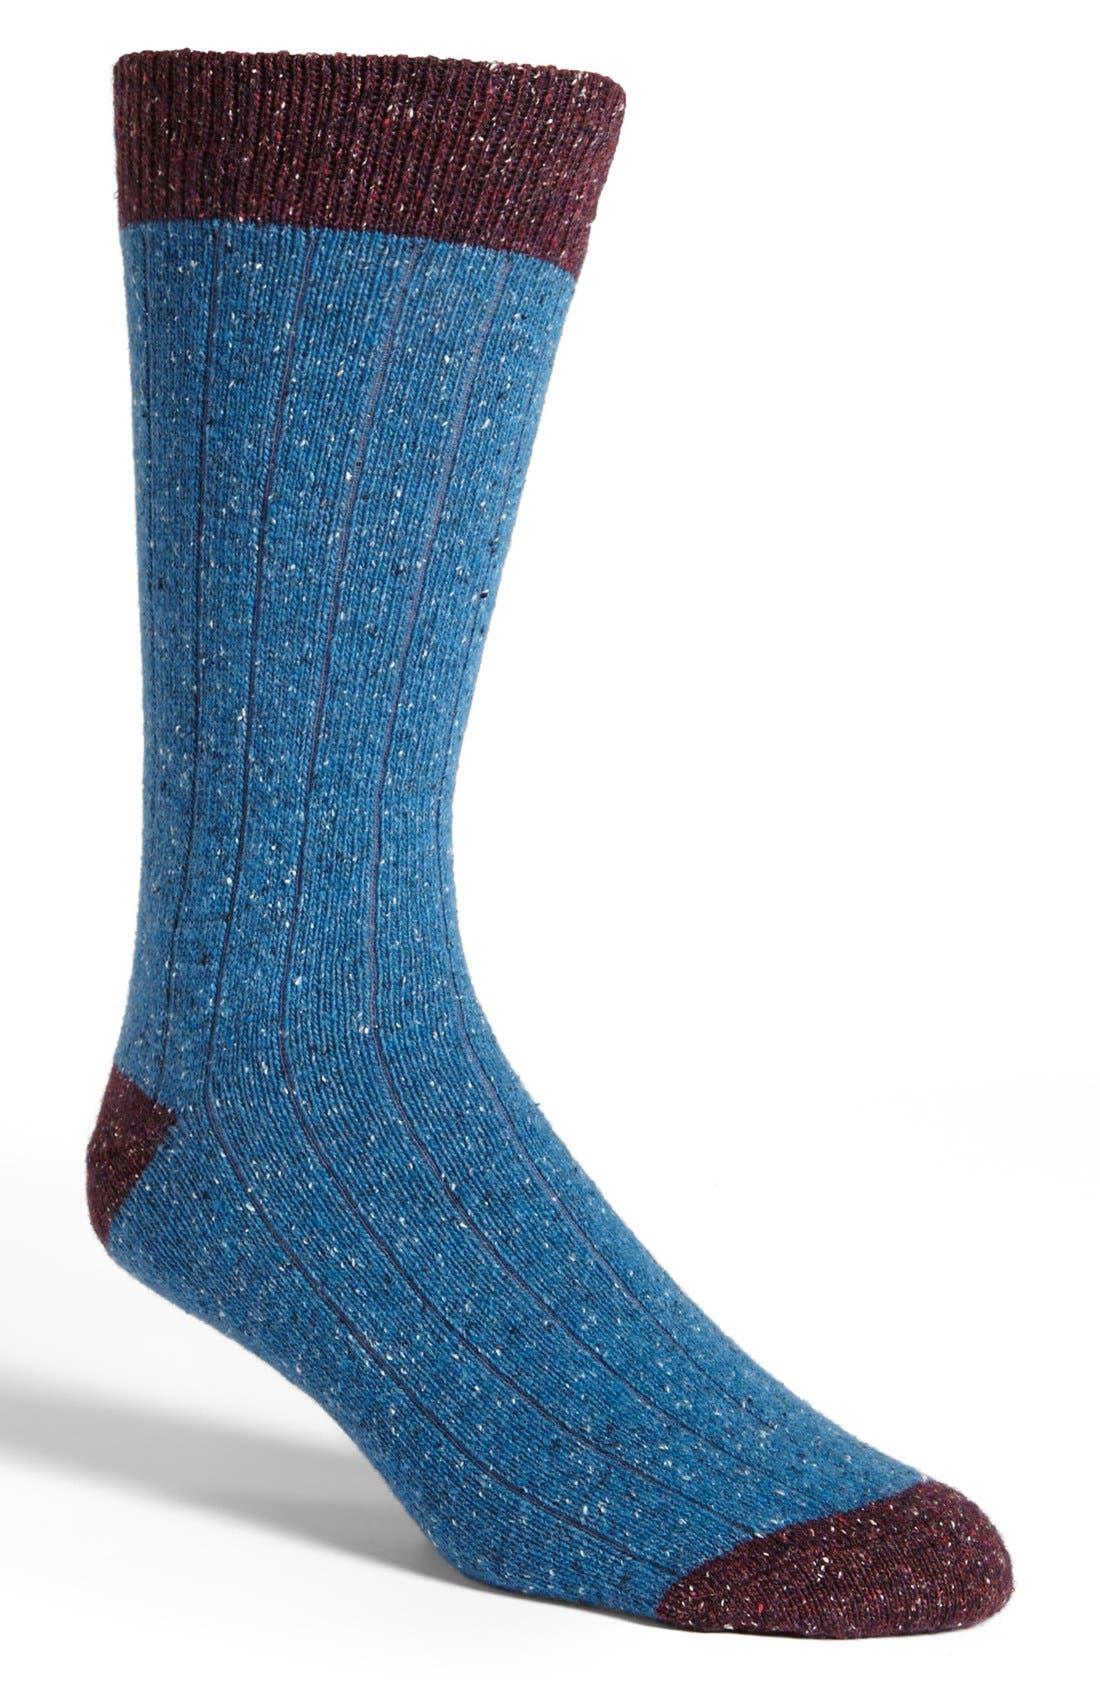 Main Image - Etiquette Clothiers Tweed Socks